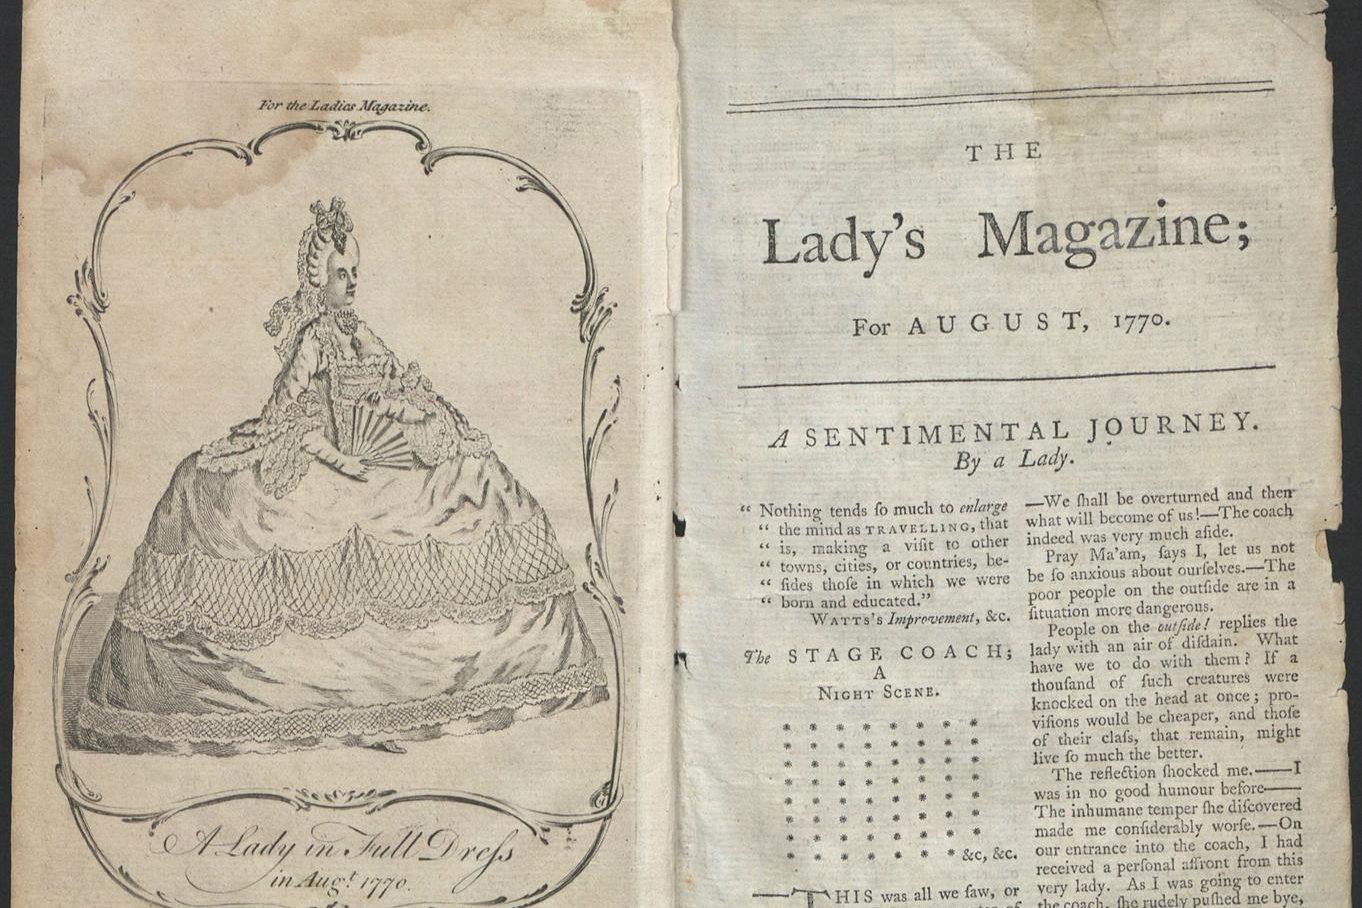 The Lady's Magazine